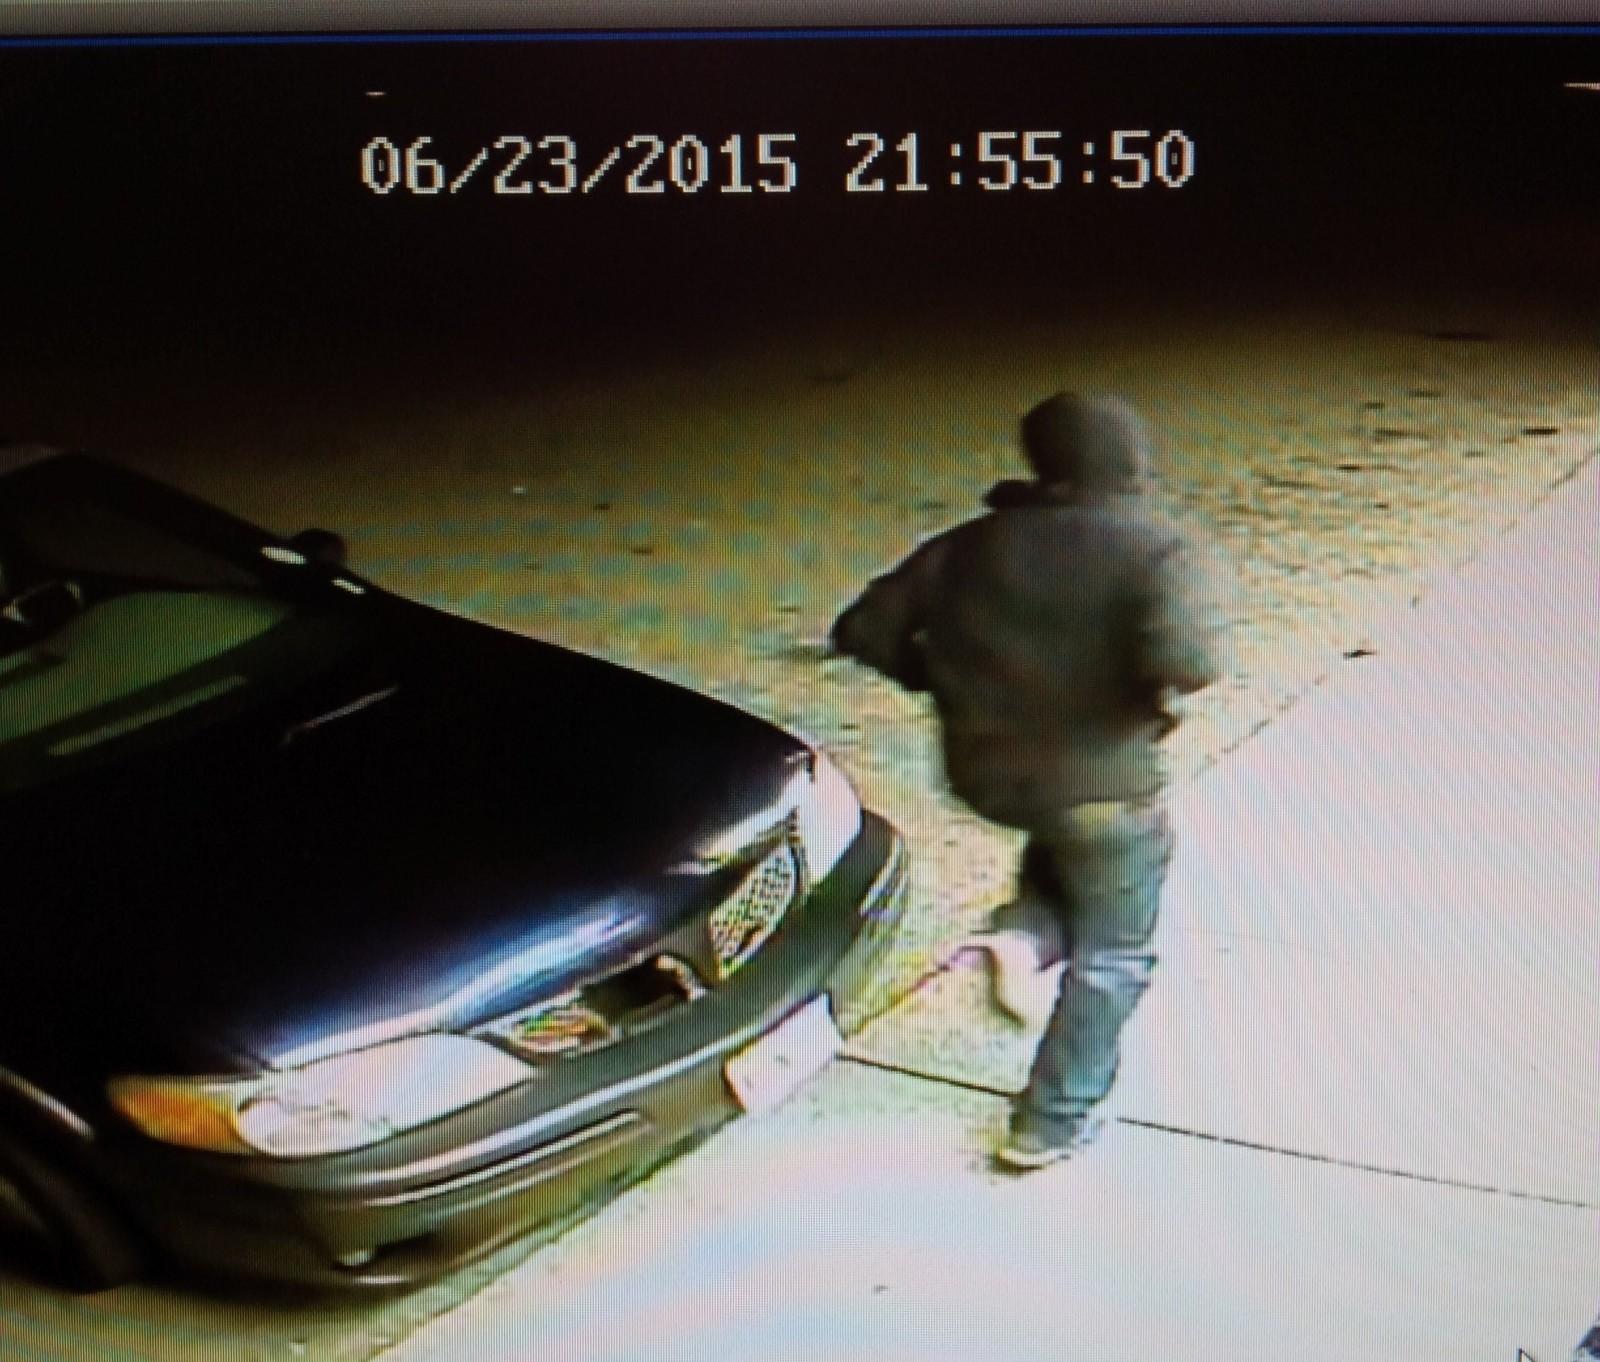 Police investigating robbery